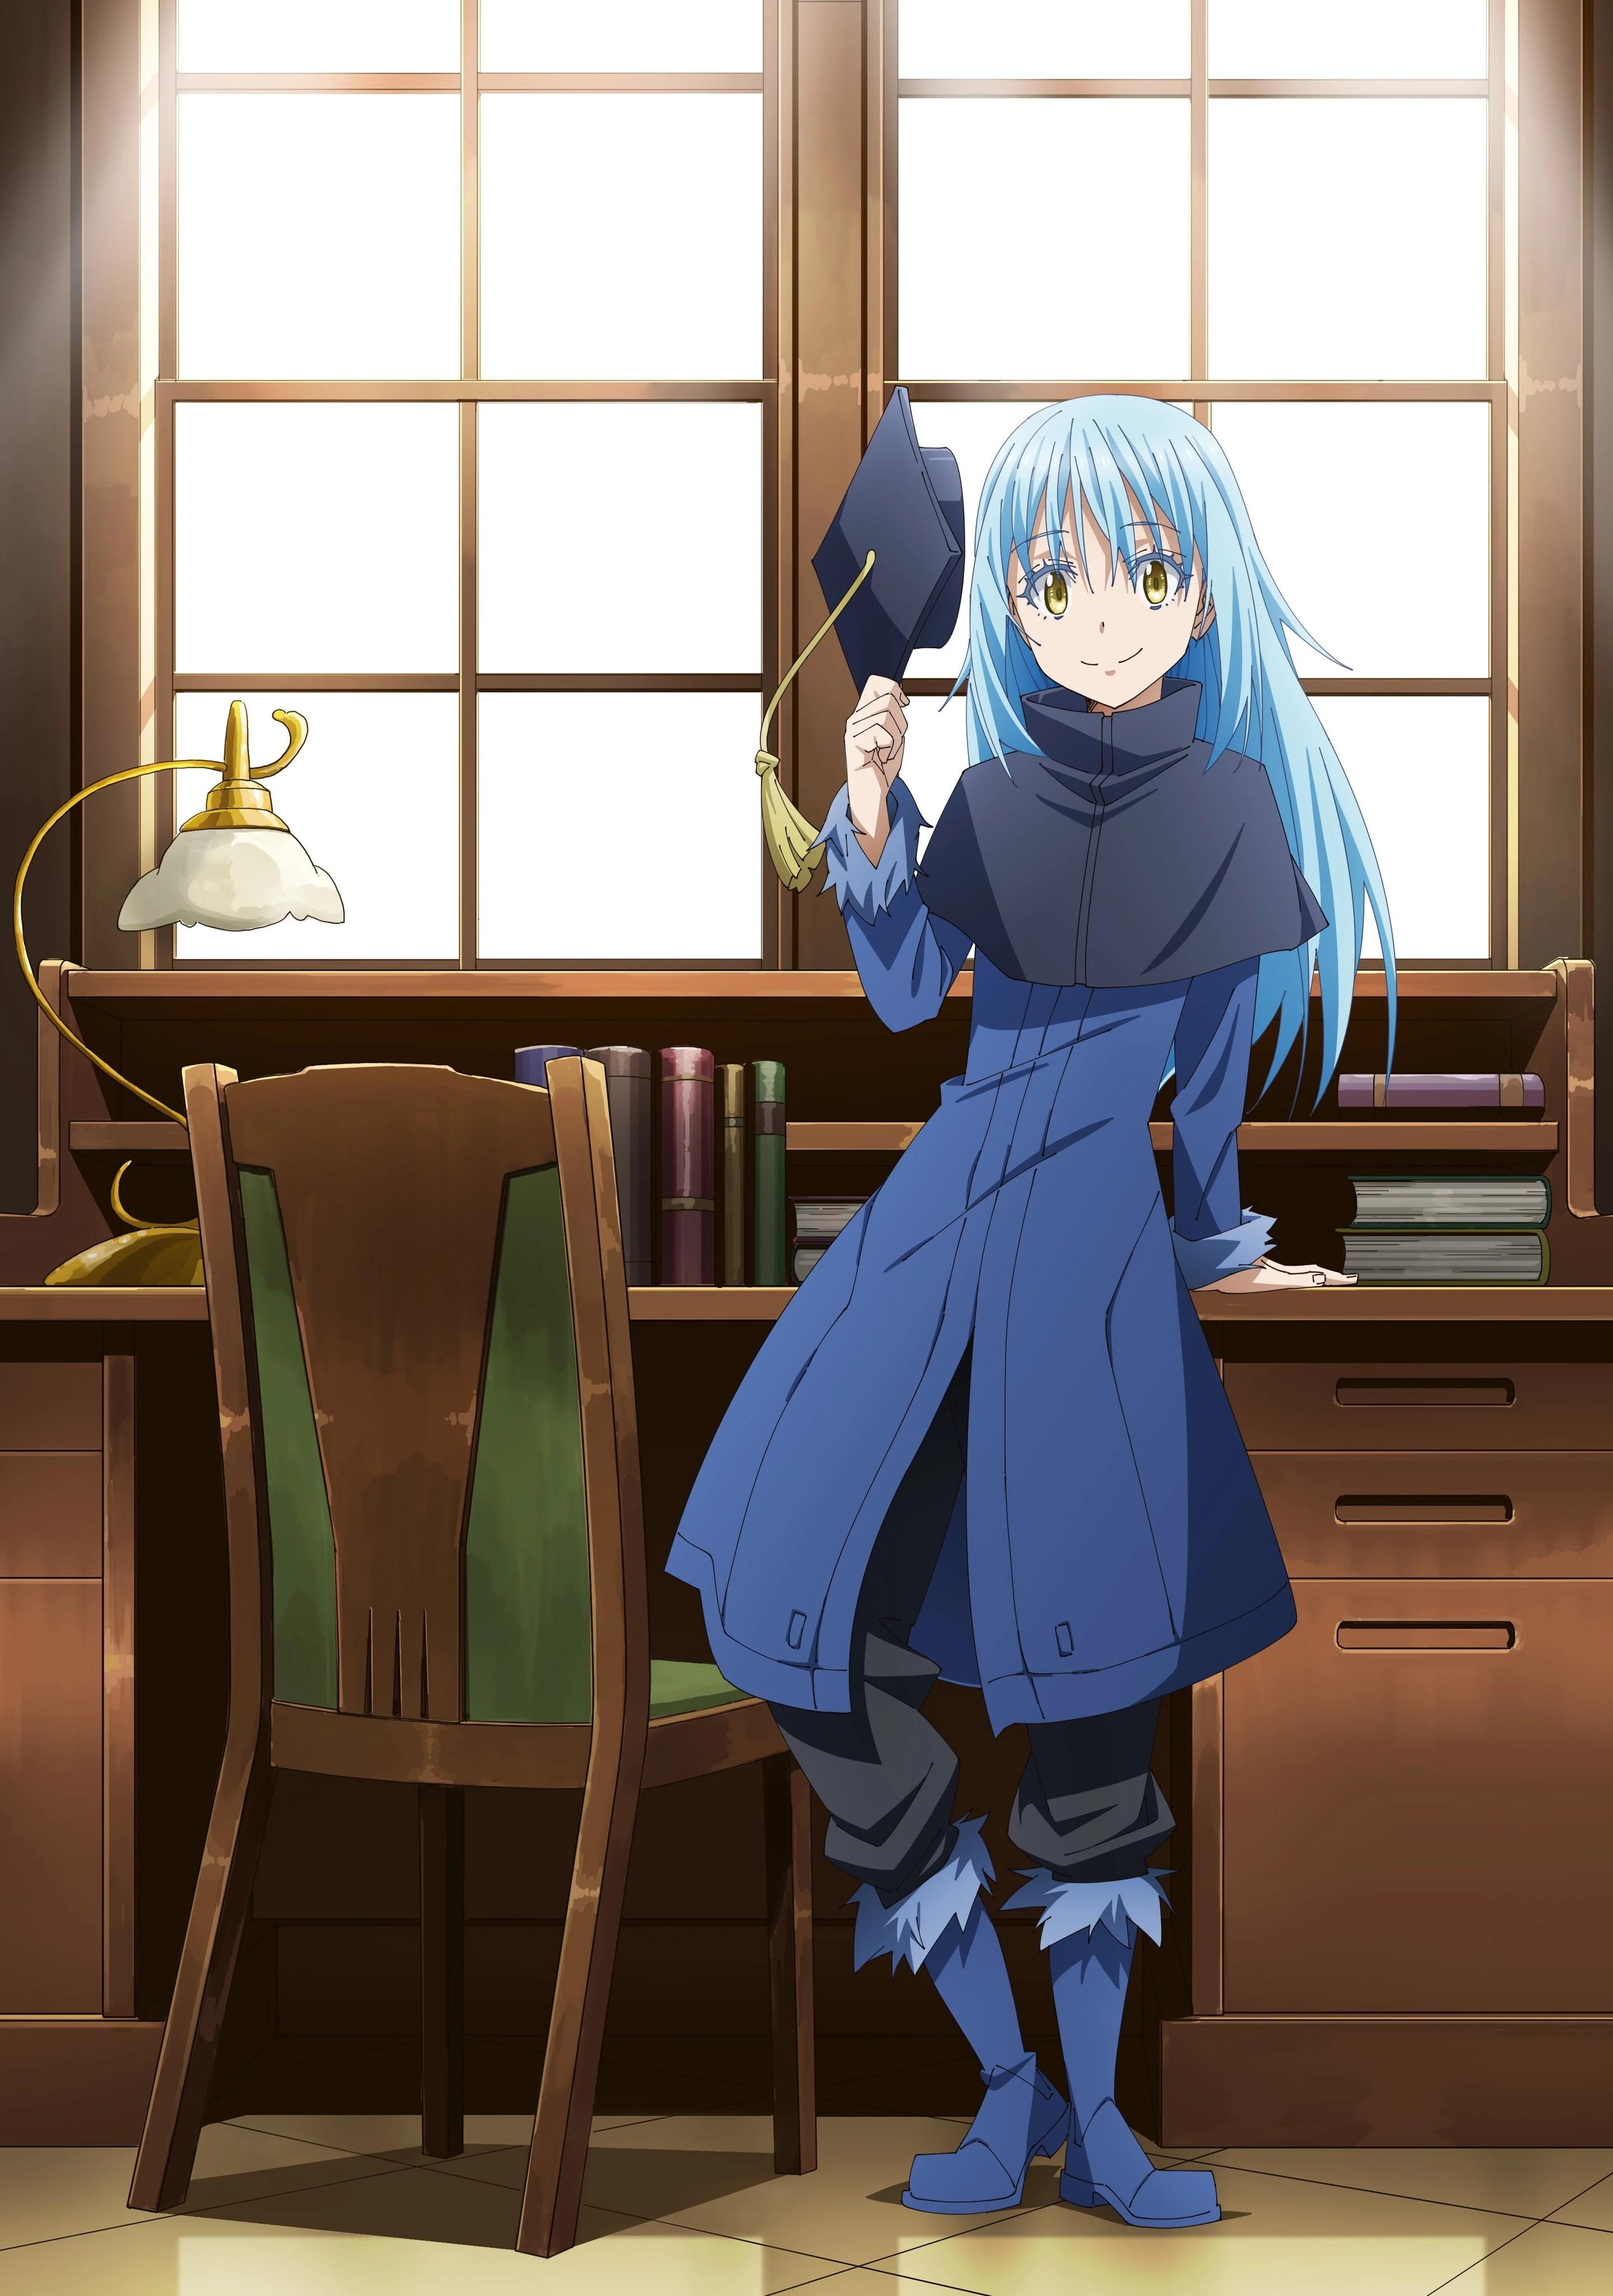 The television anime's voice actors ami koshimizu (holo) and jun fukuyama (kraft lawrence) are returning. Extra Rimuru S Glamorous Life As A Teacher Part 1 Tensei Shitara Slime Datta Ken Wiki Fandom